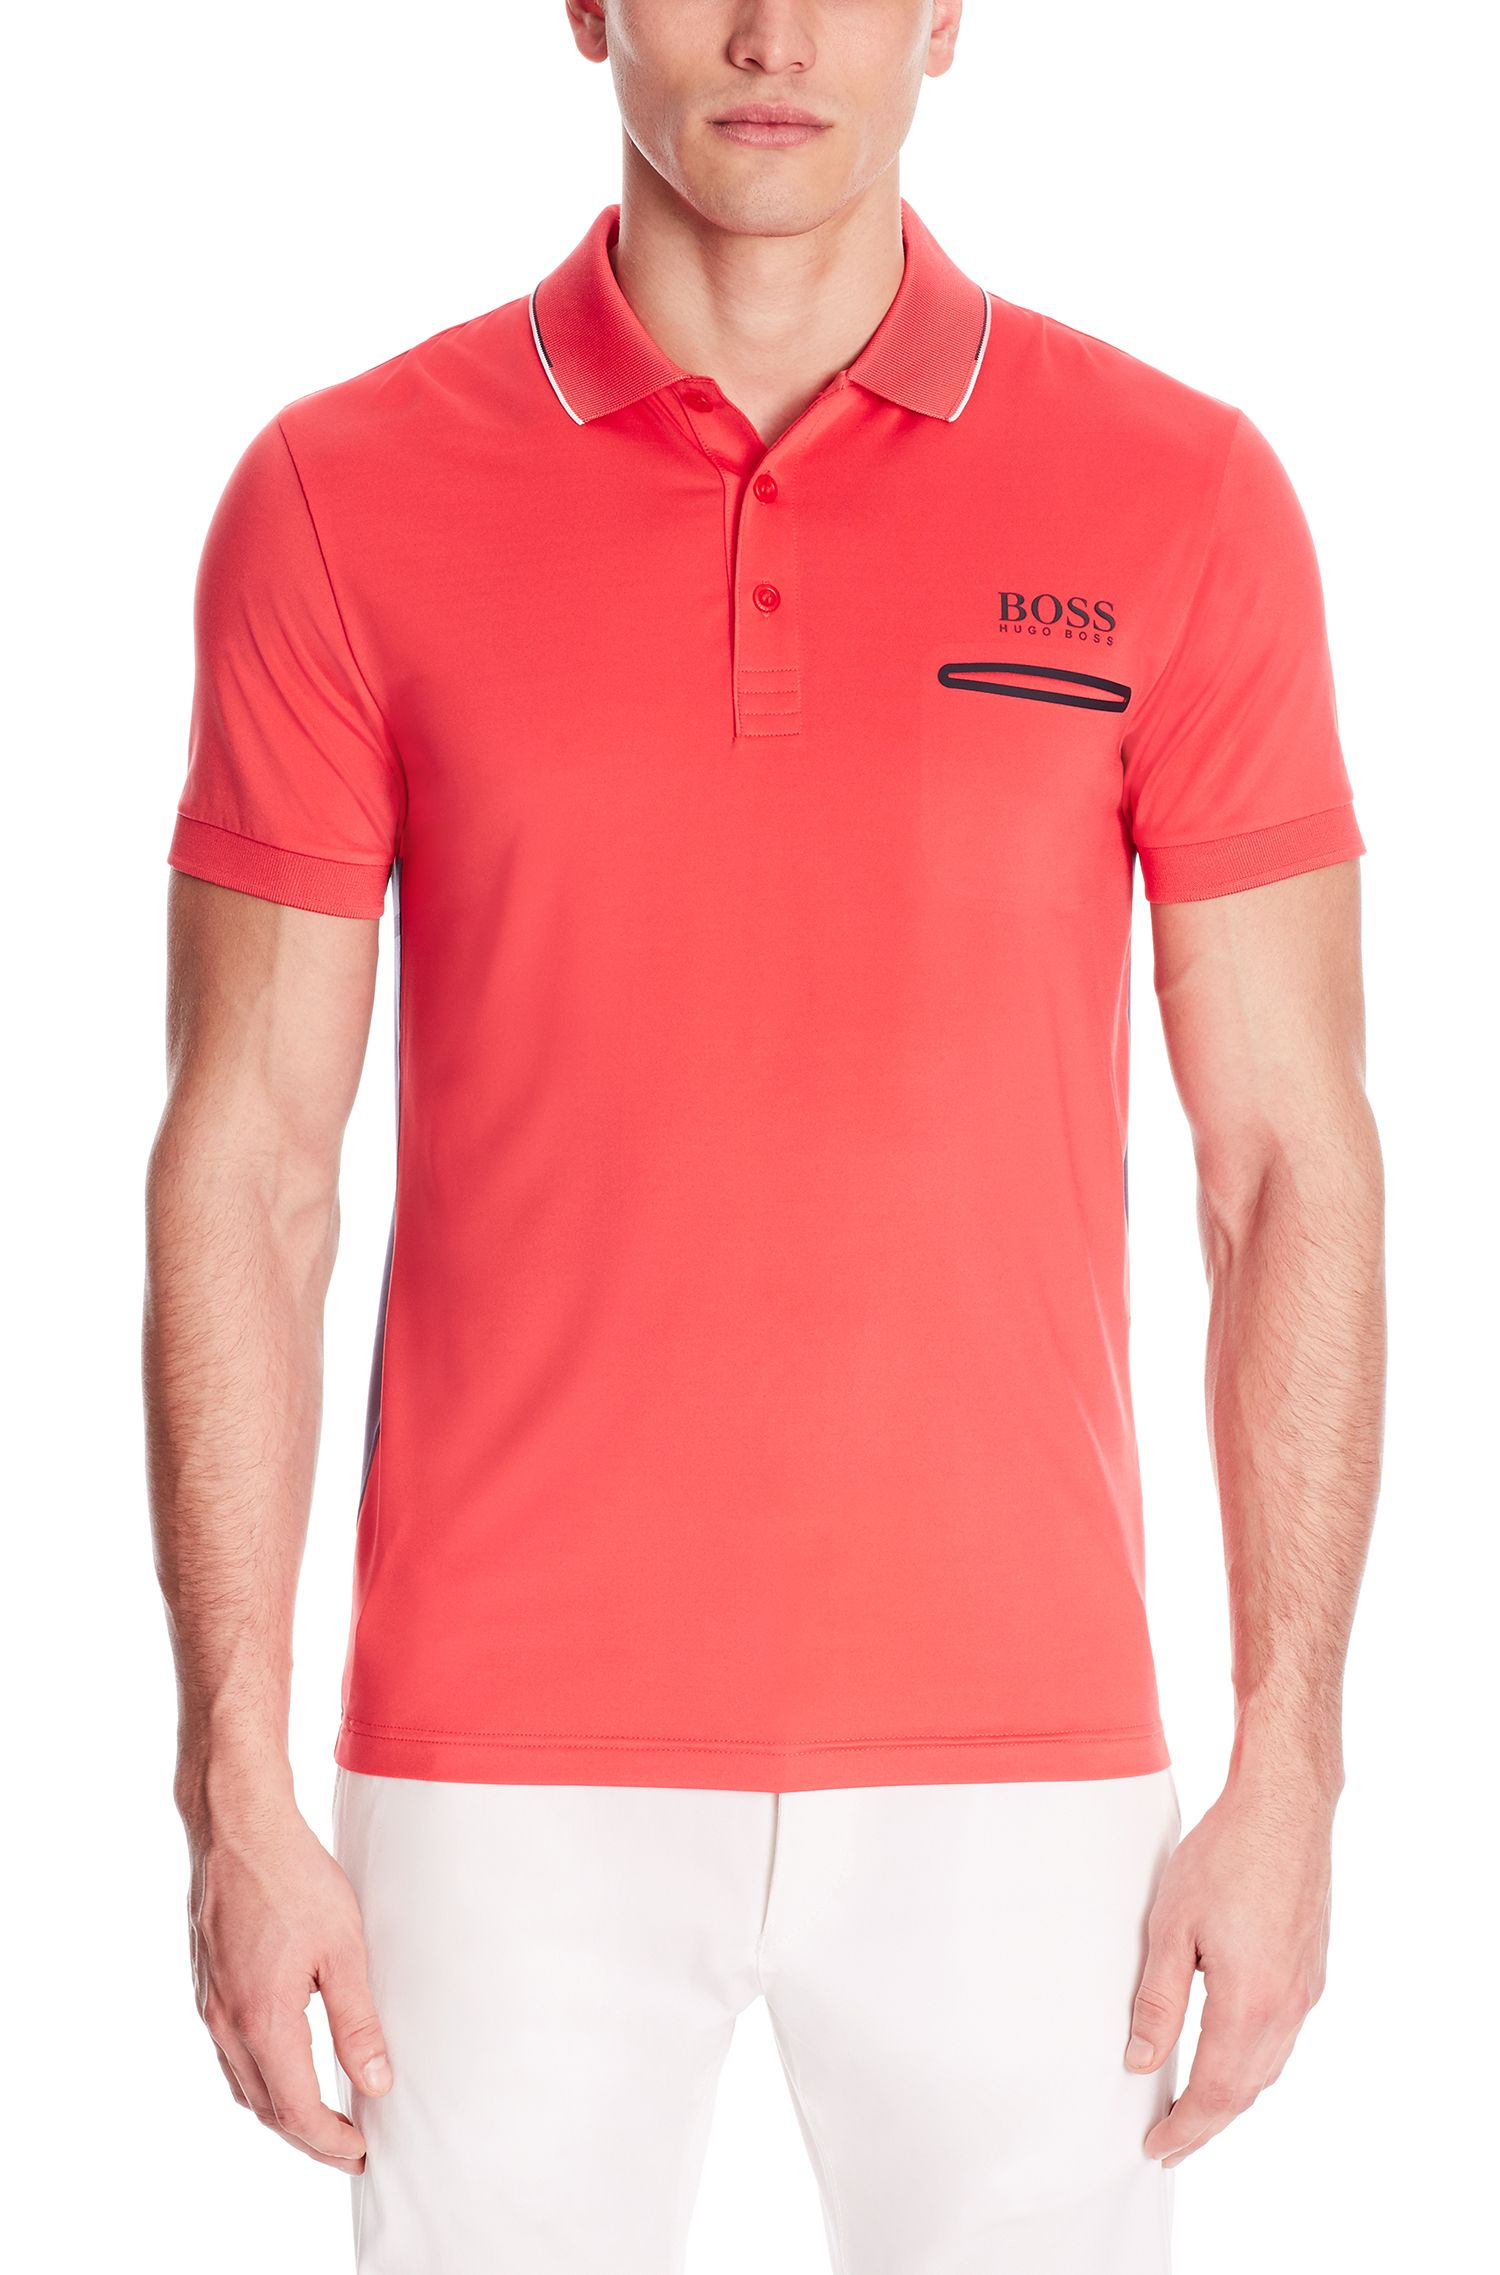 Moisture Manager Stretch Cotton Blend Polo Shirt, Slim Fit | Paule Pro